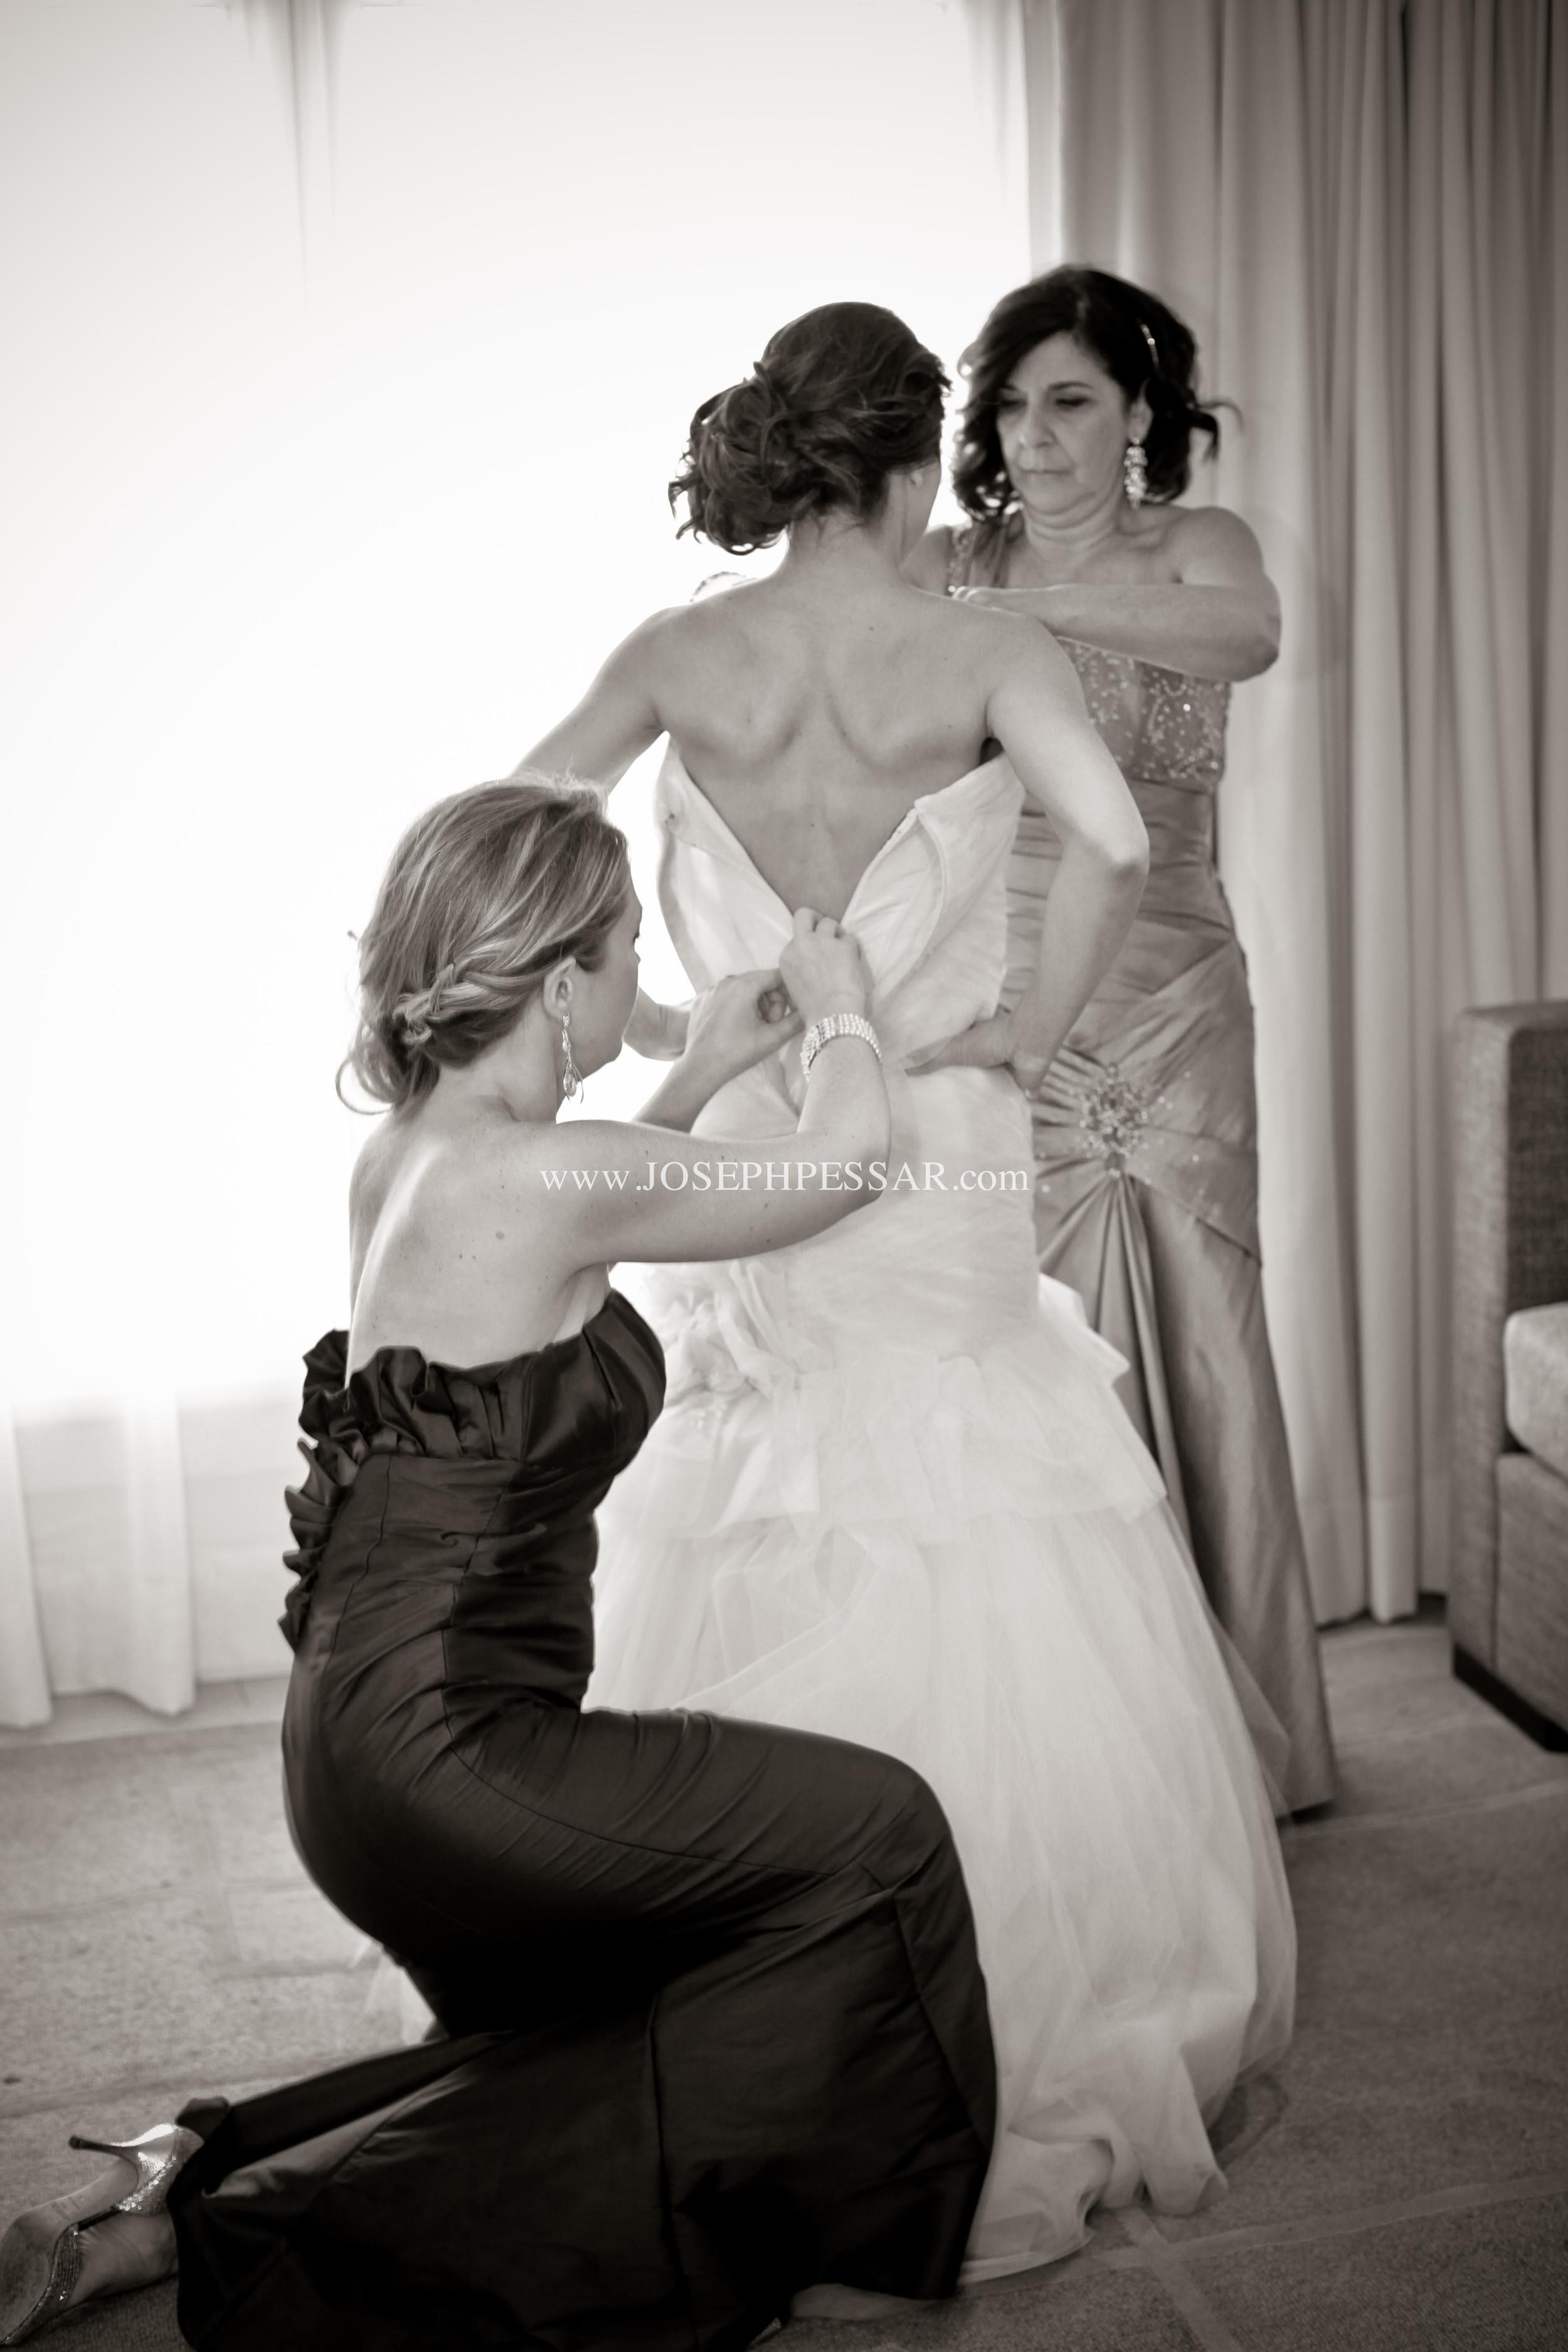 nyc_wedding_photographer0008.jpg